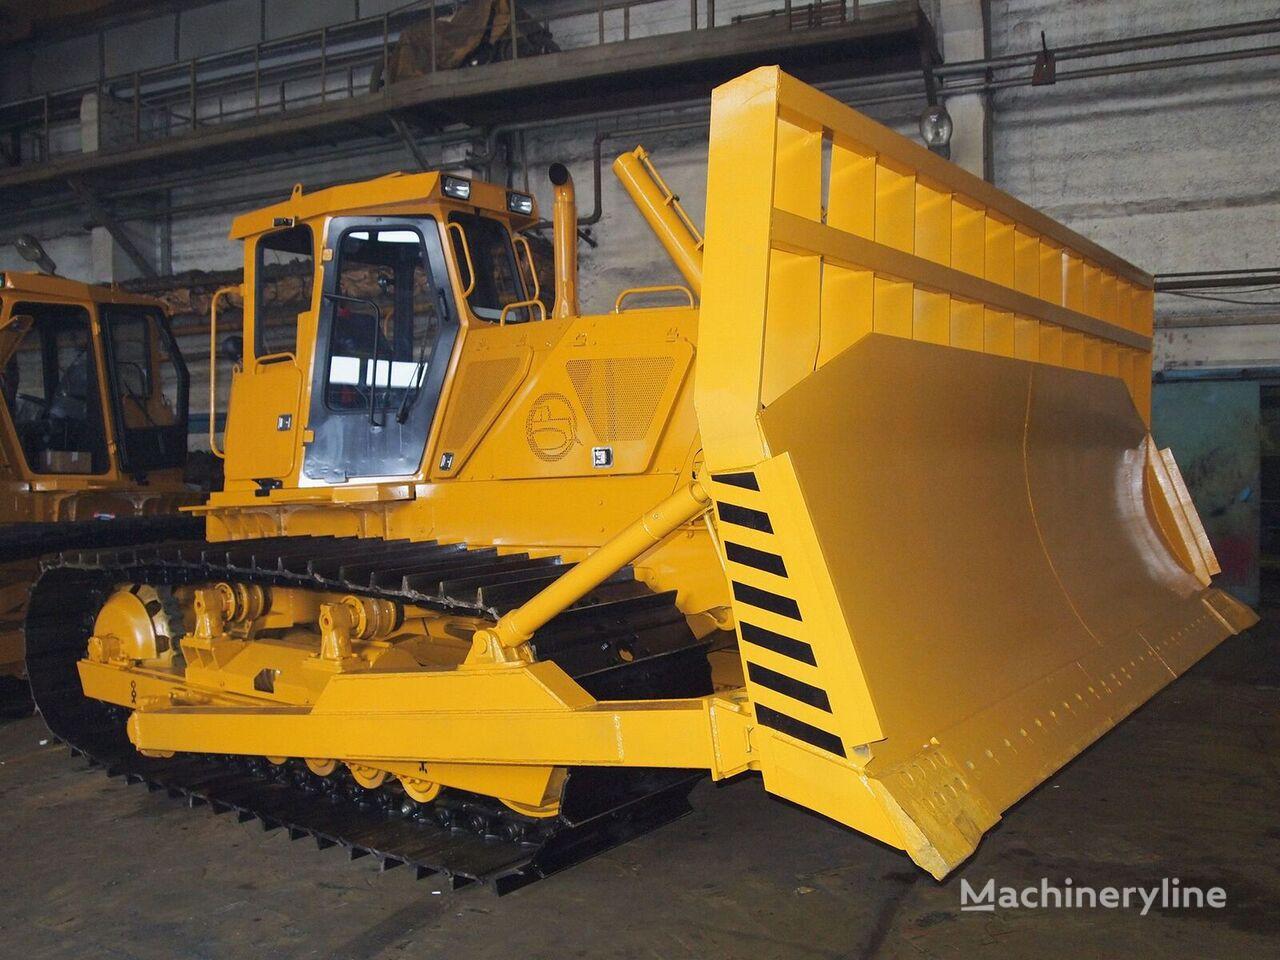 URAL bulldozer